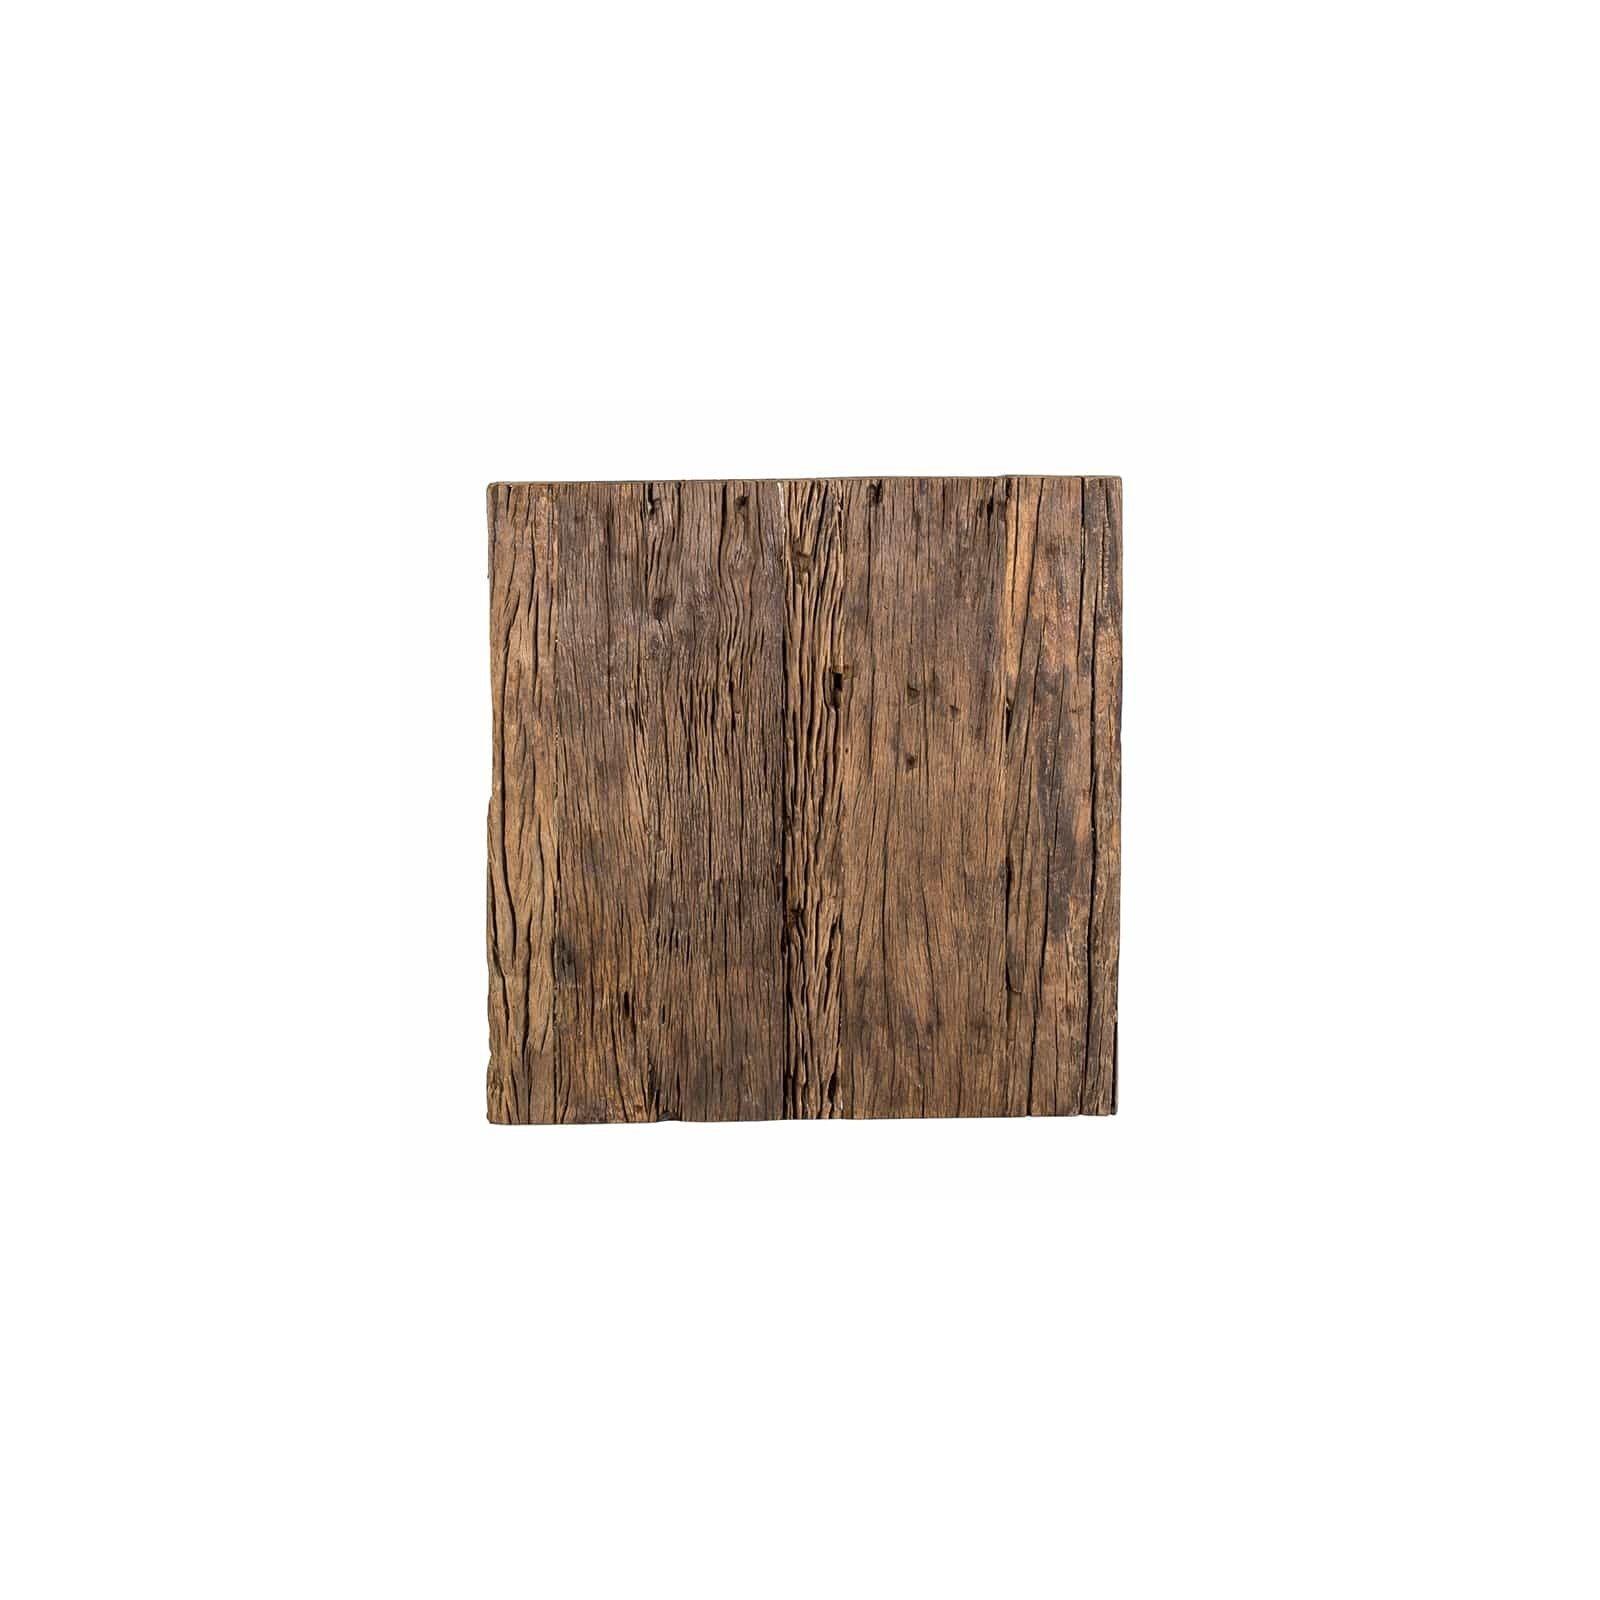 Table d'angle Kensington 60x60 Meuble Déco Tendance - 208